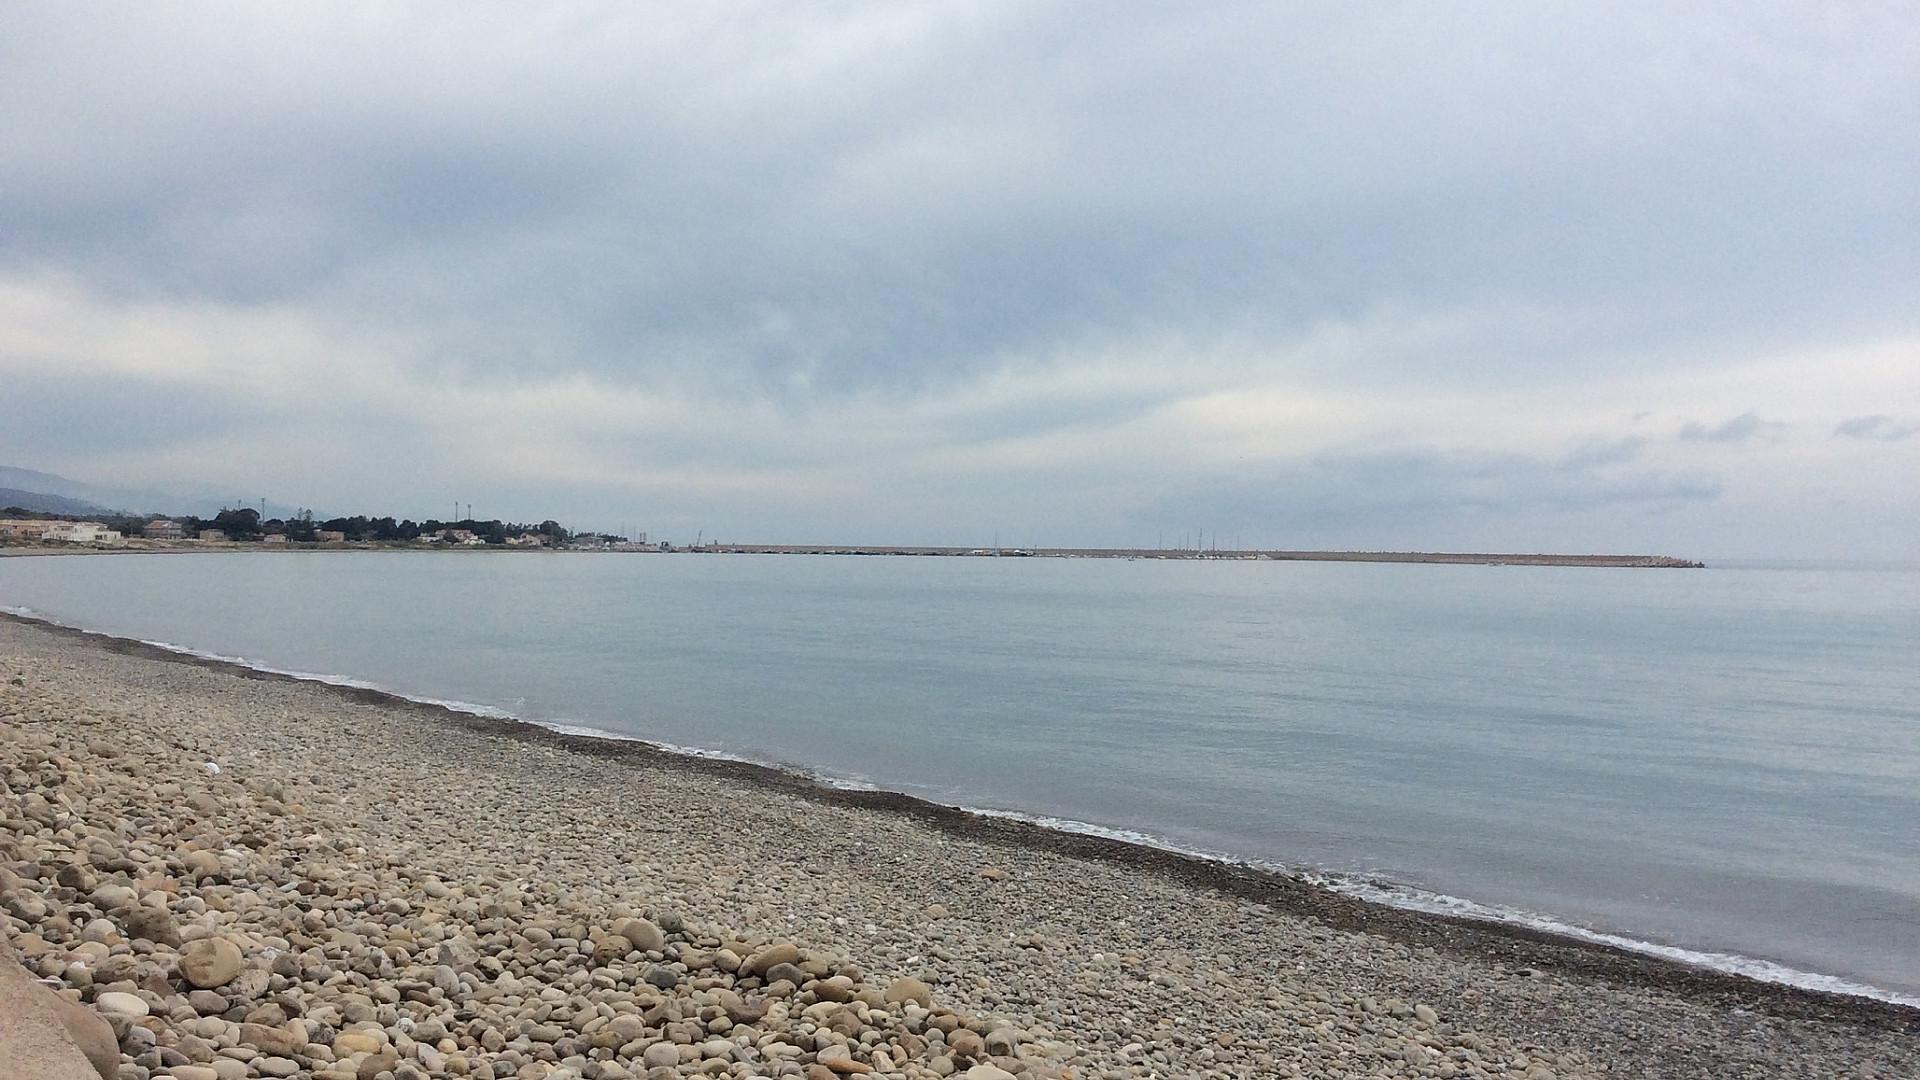 Spiaggia di Pace